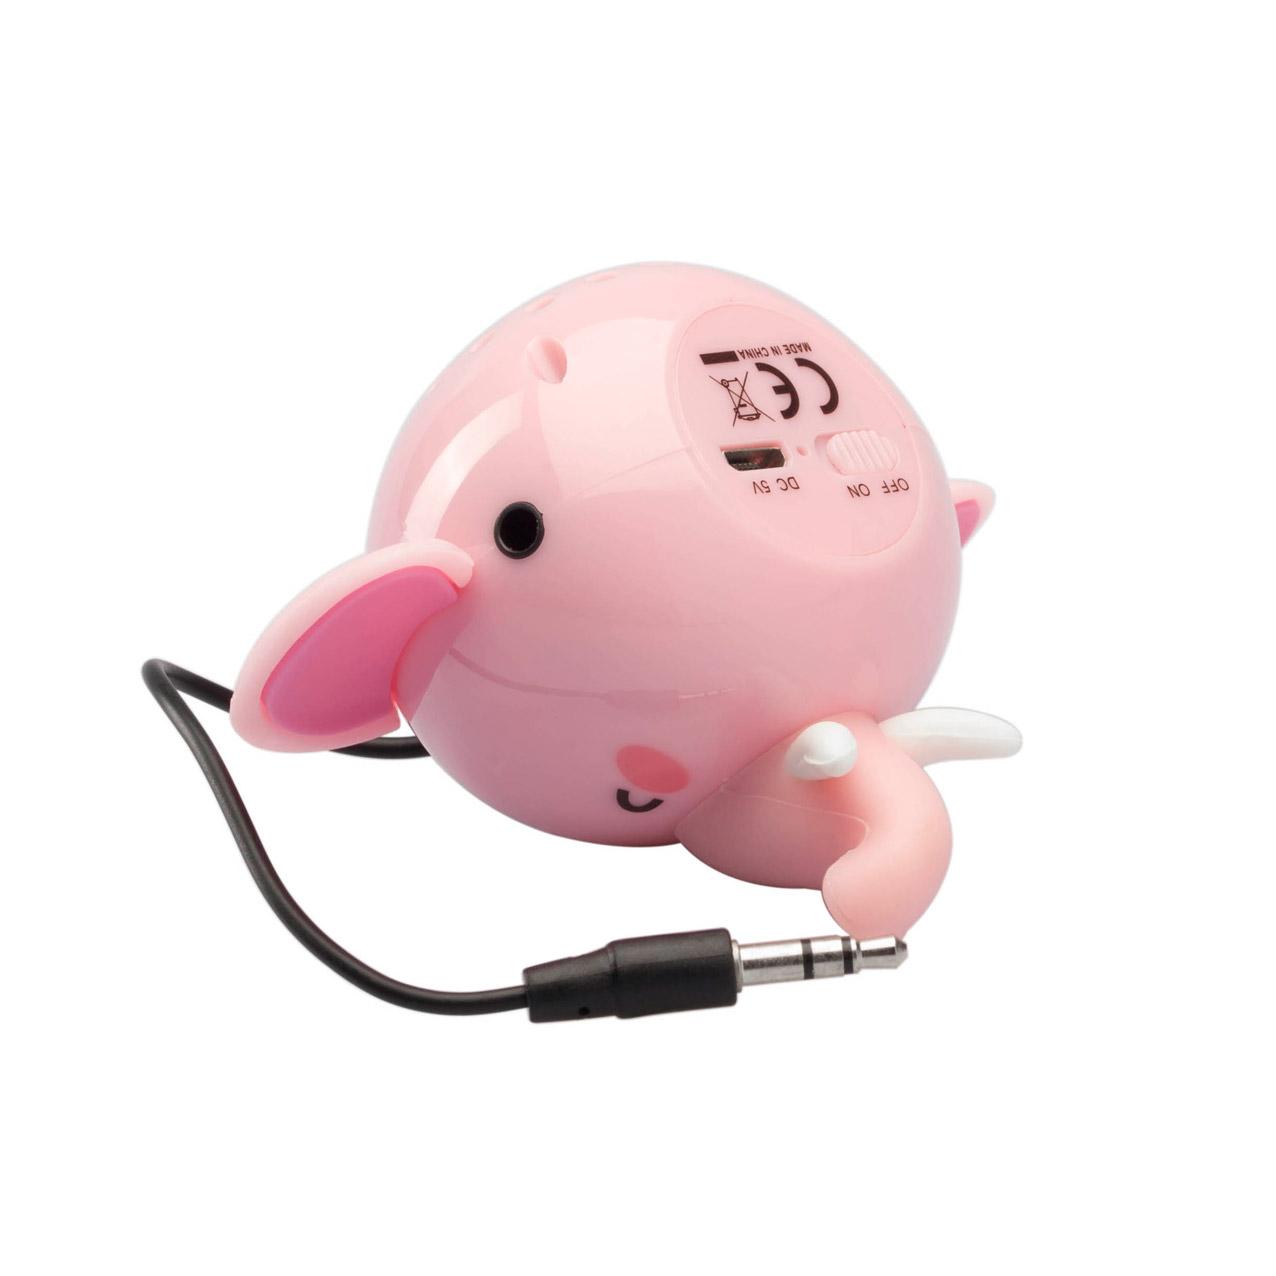 Mini Speaker altoparlante portatile - elefantino_2